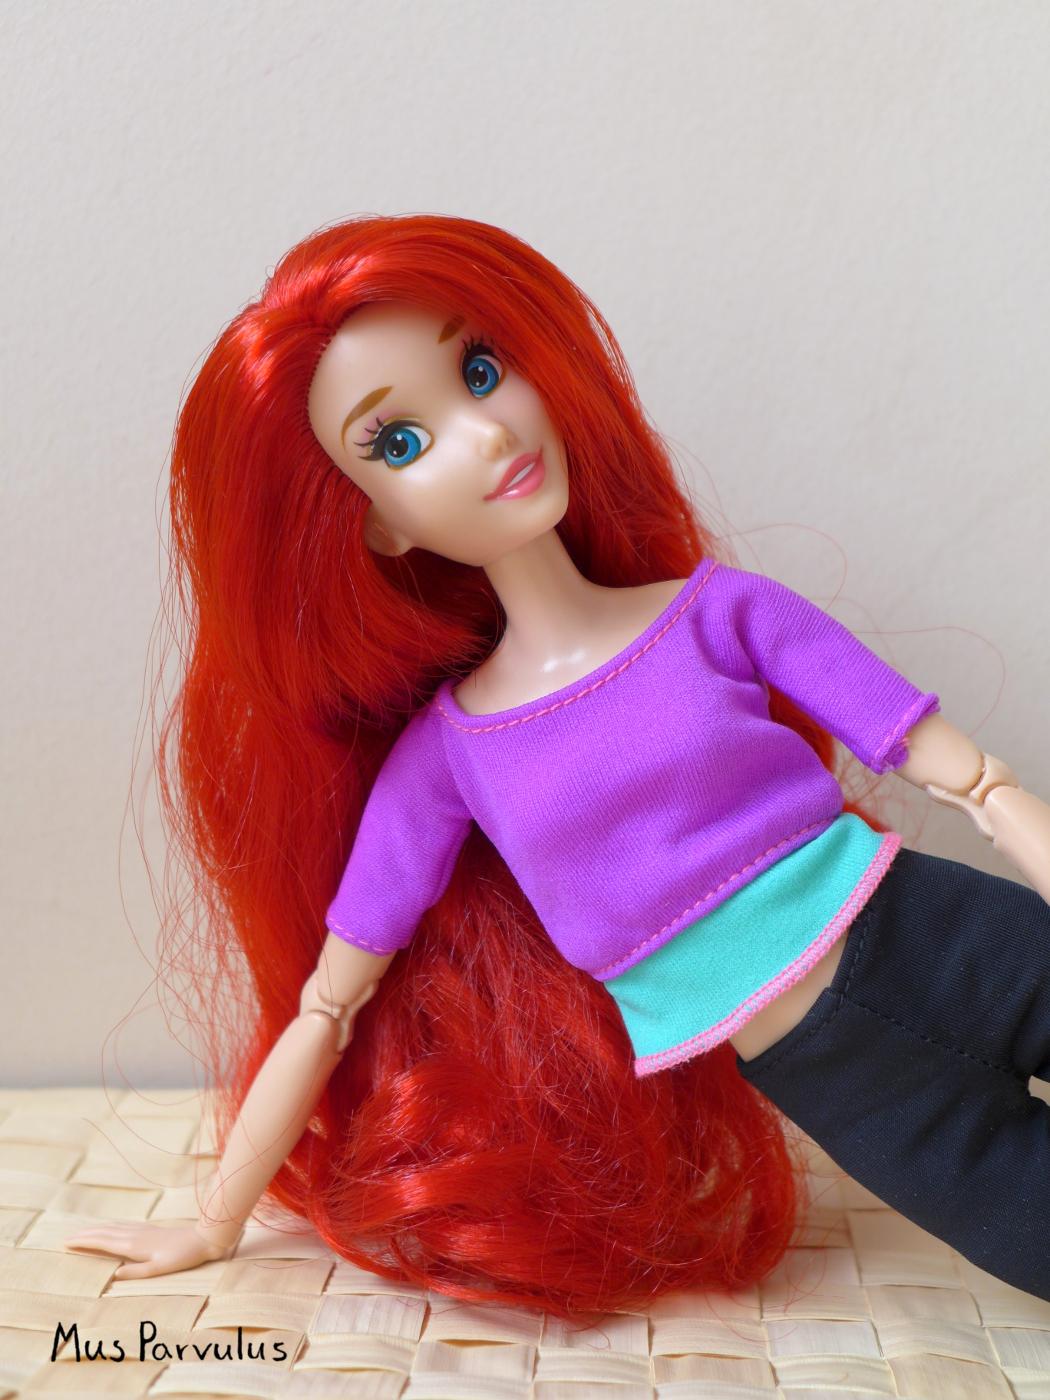 RETIRED 2016 Disney Store ARIEL Classic doll Little Mermaid Disney Princess rare